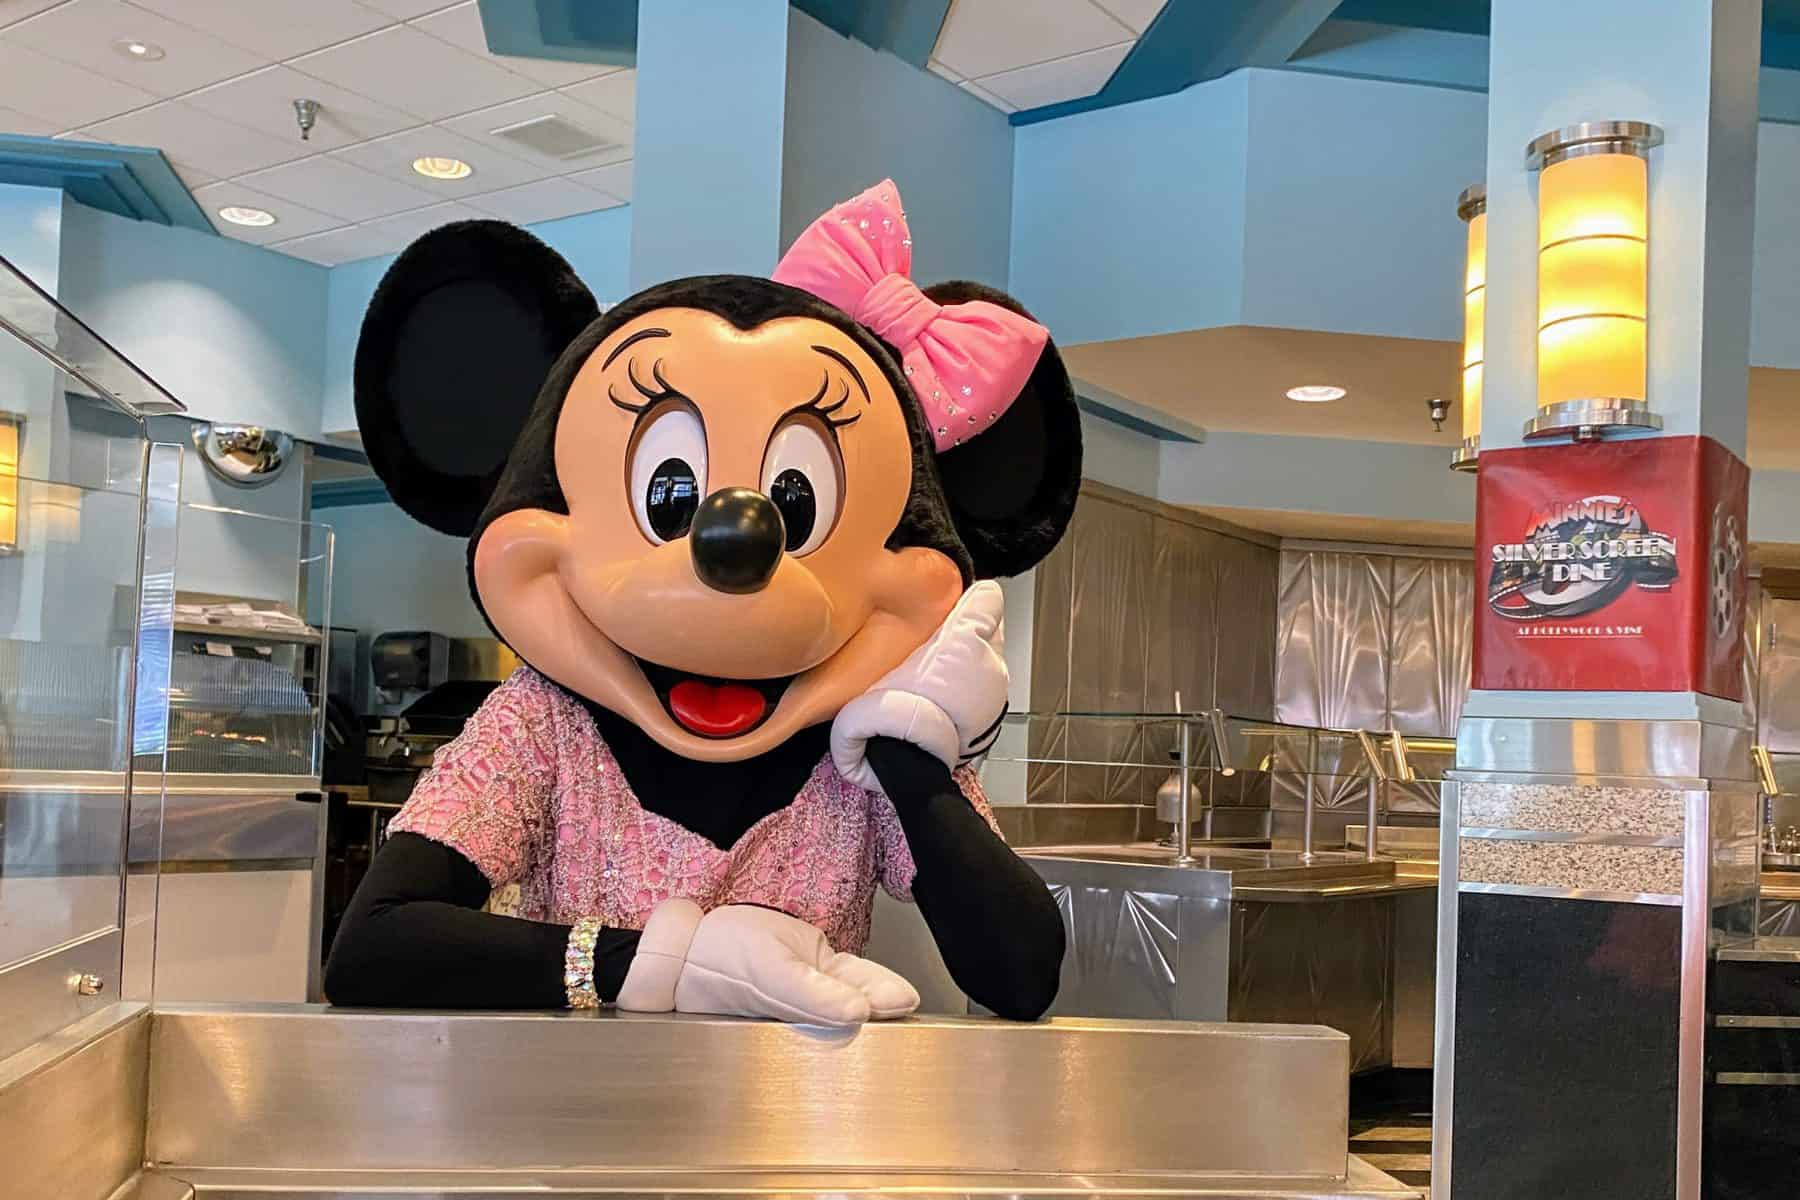 Minnie at Hollywood & Vine